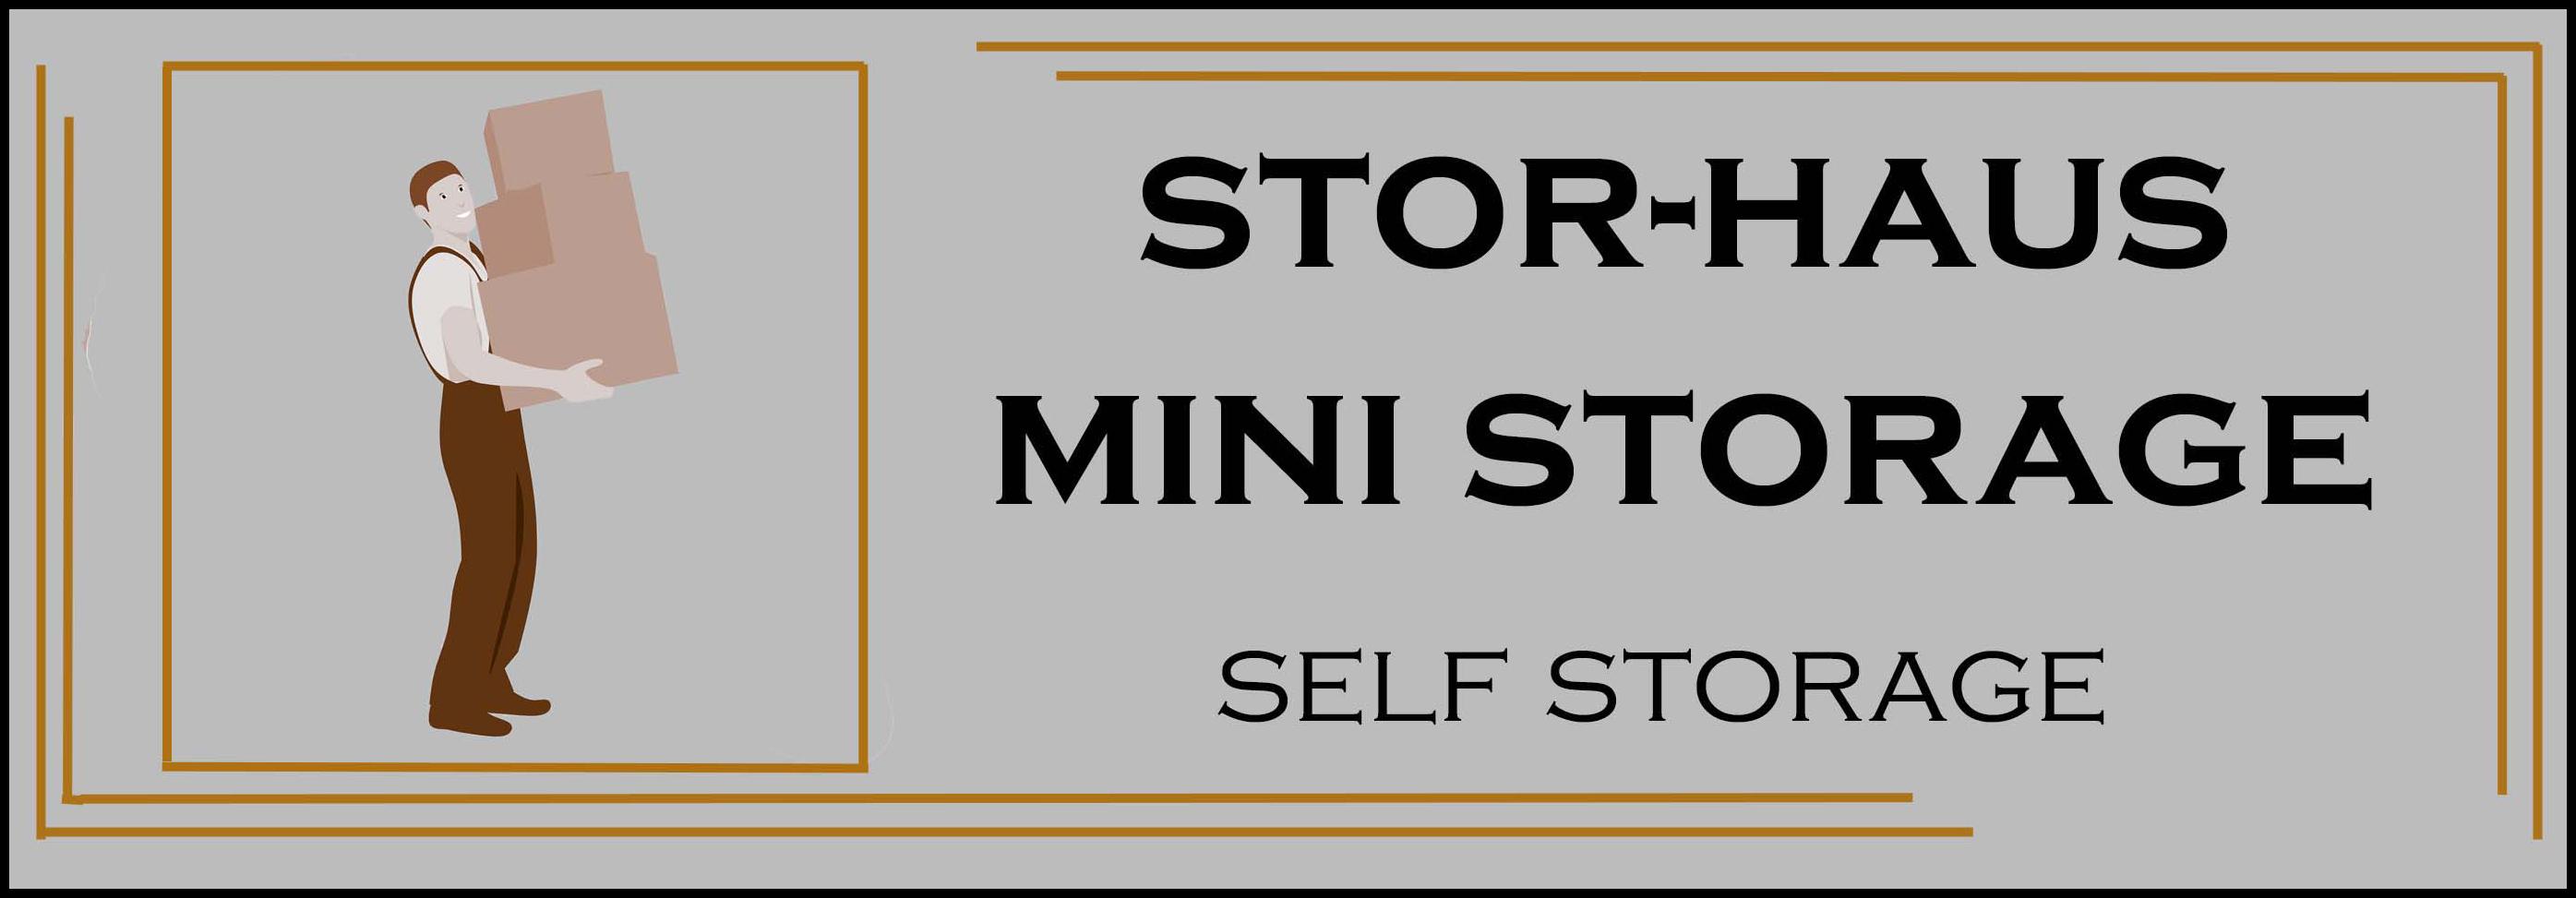 Stor-Haus Mini Storage